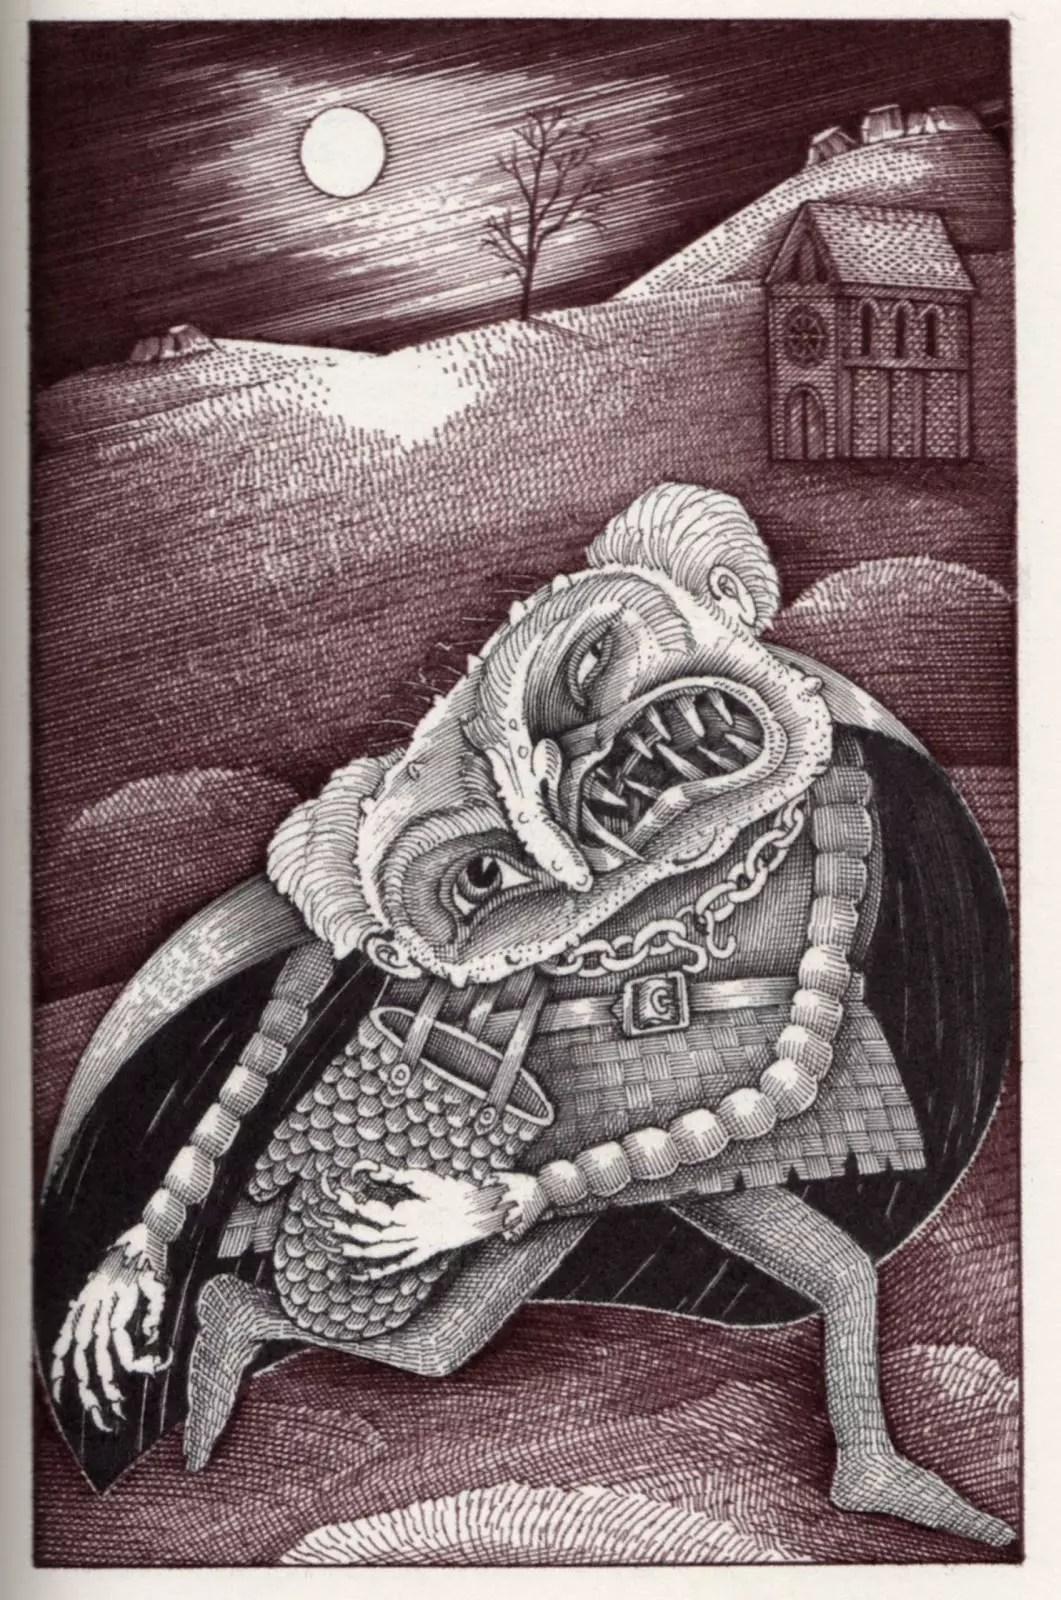 Grendel from FS British Myths & Legends – beautifulbooks.info